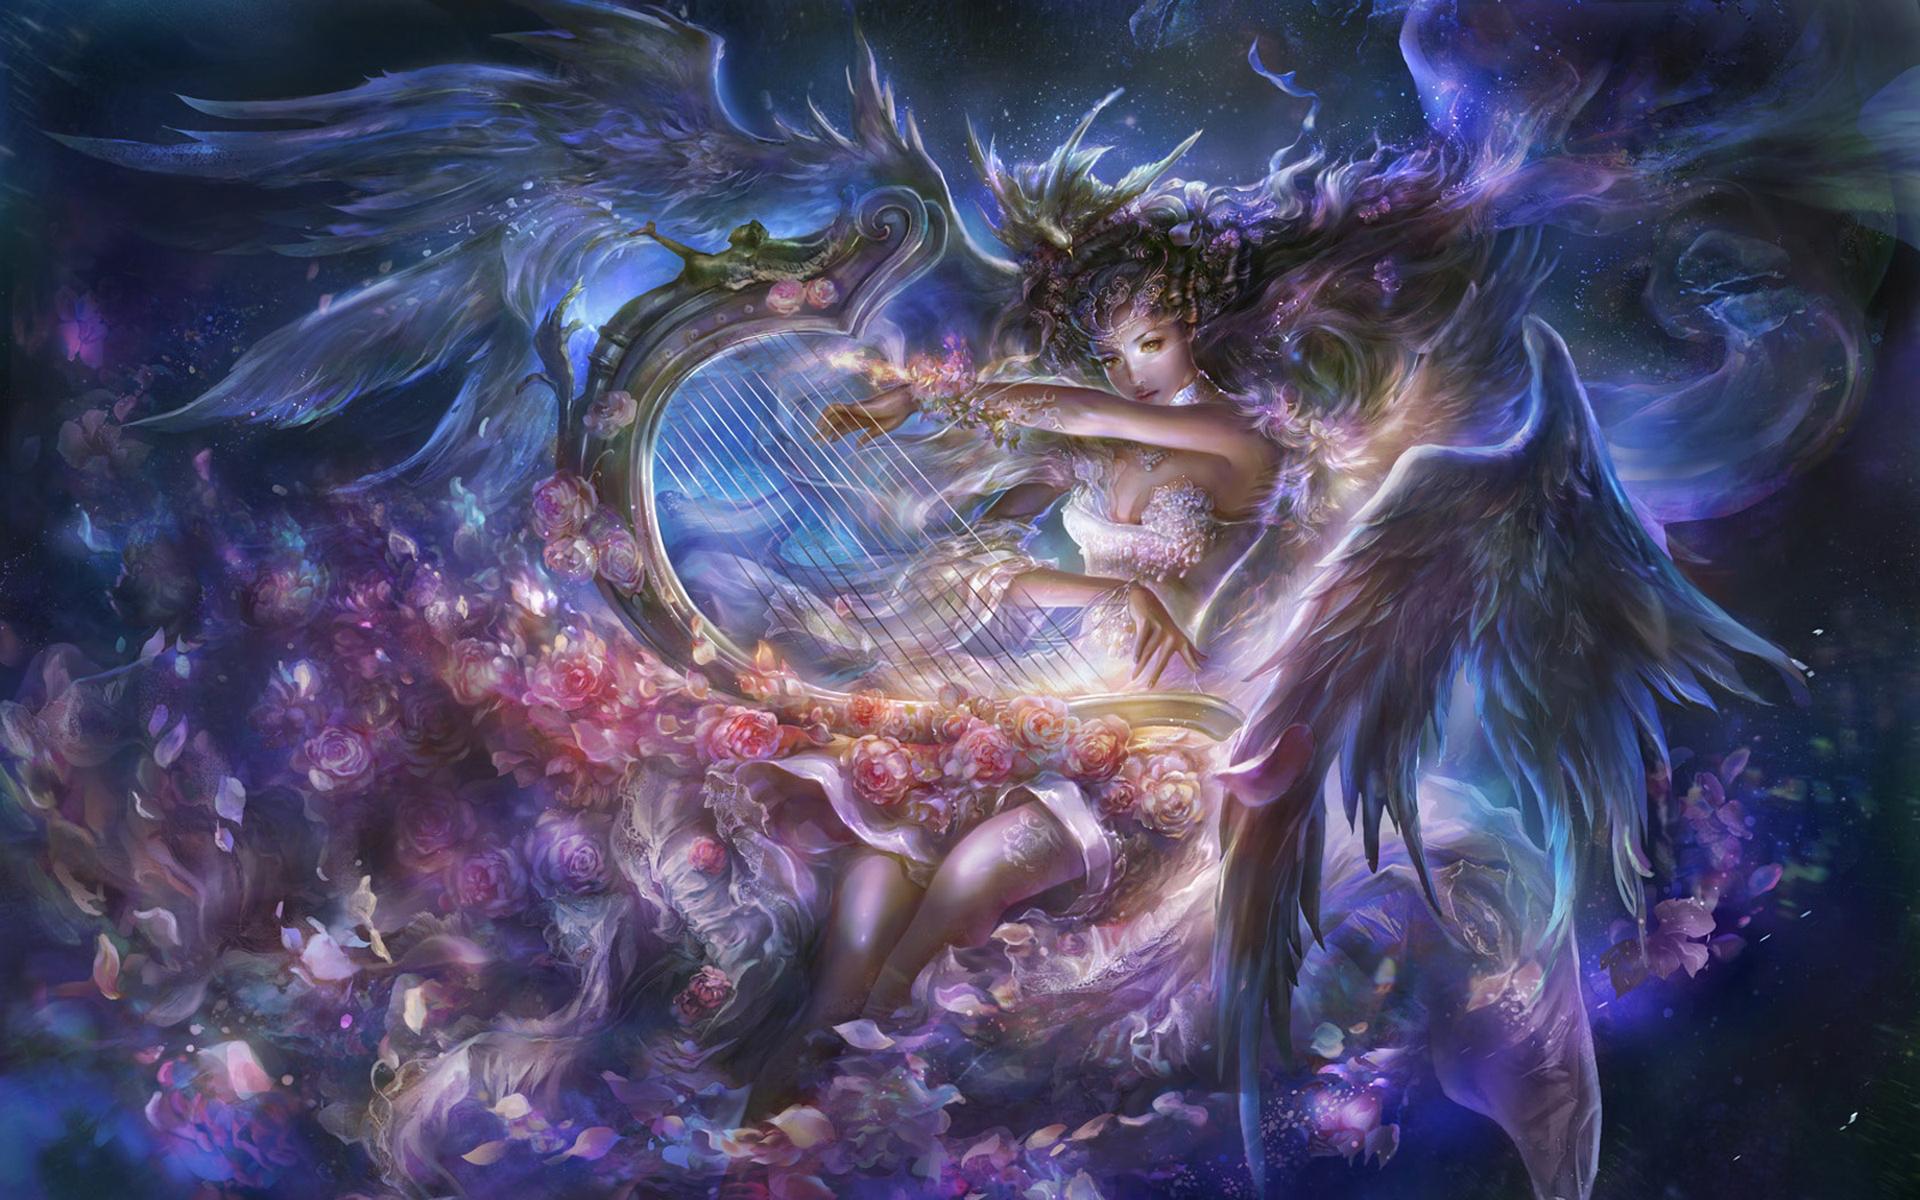 Angels Harp HD Wallpaper Background Image 1920x1200 ID 1920x1200